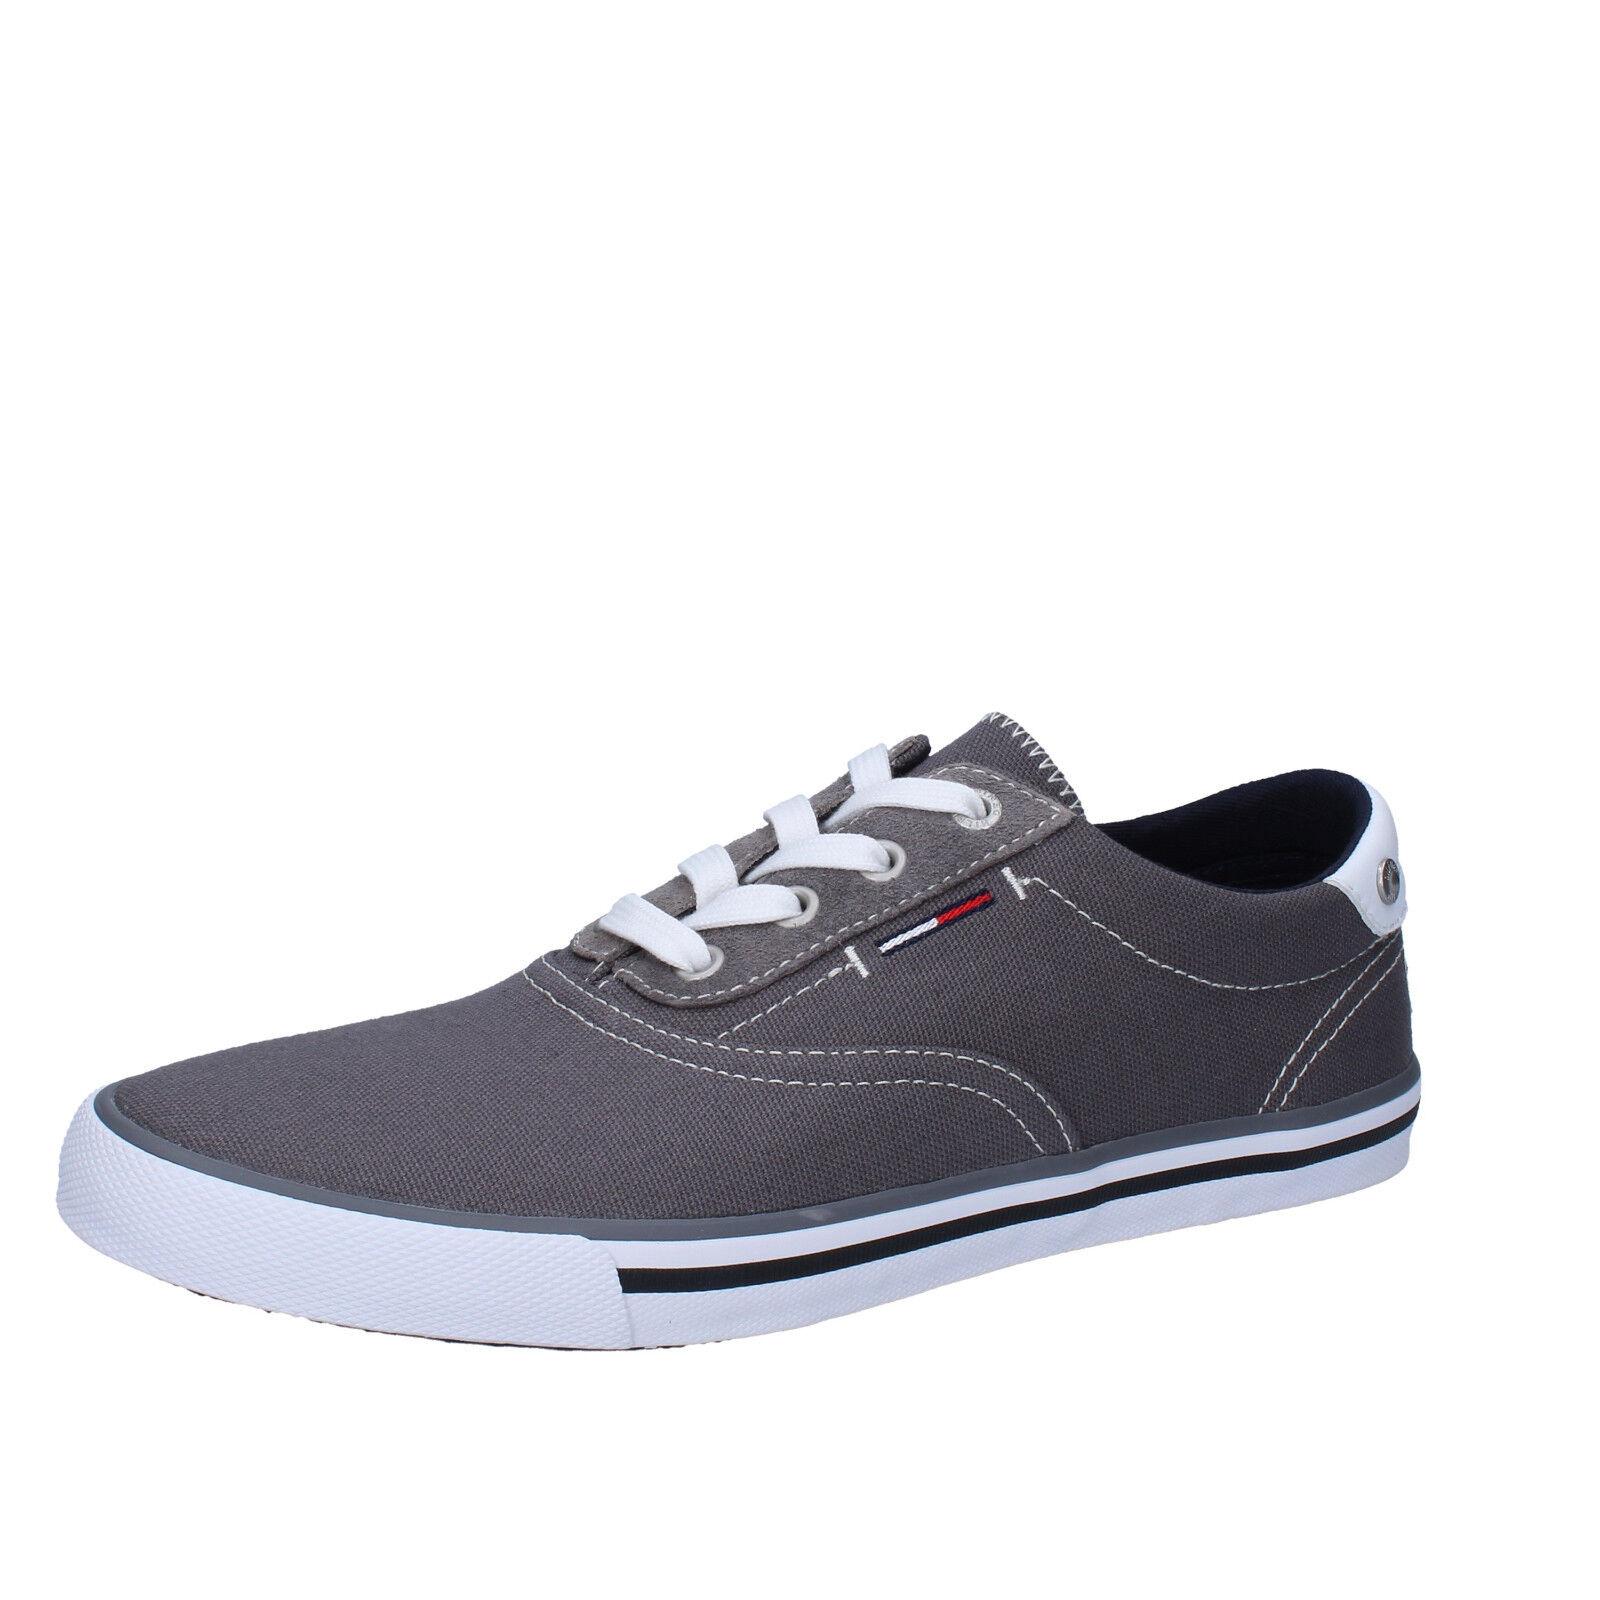 men's shoes TOMMY HILFIGER DENIM 12 () sneakers gray textile AB948-G